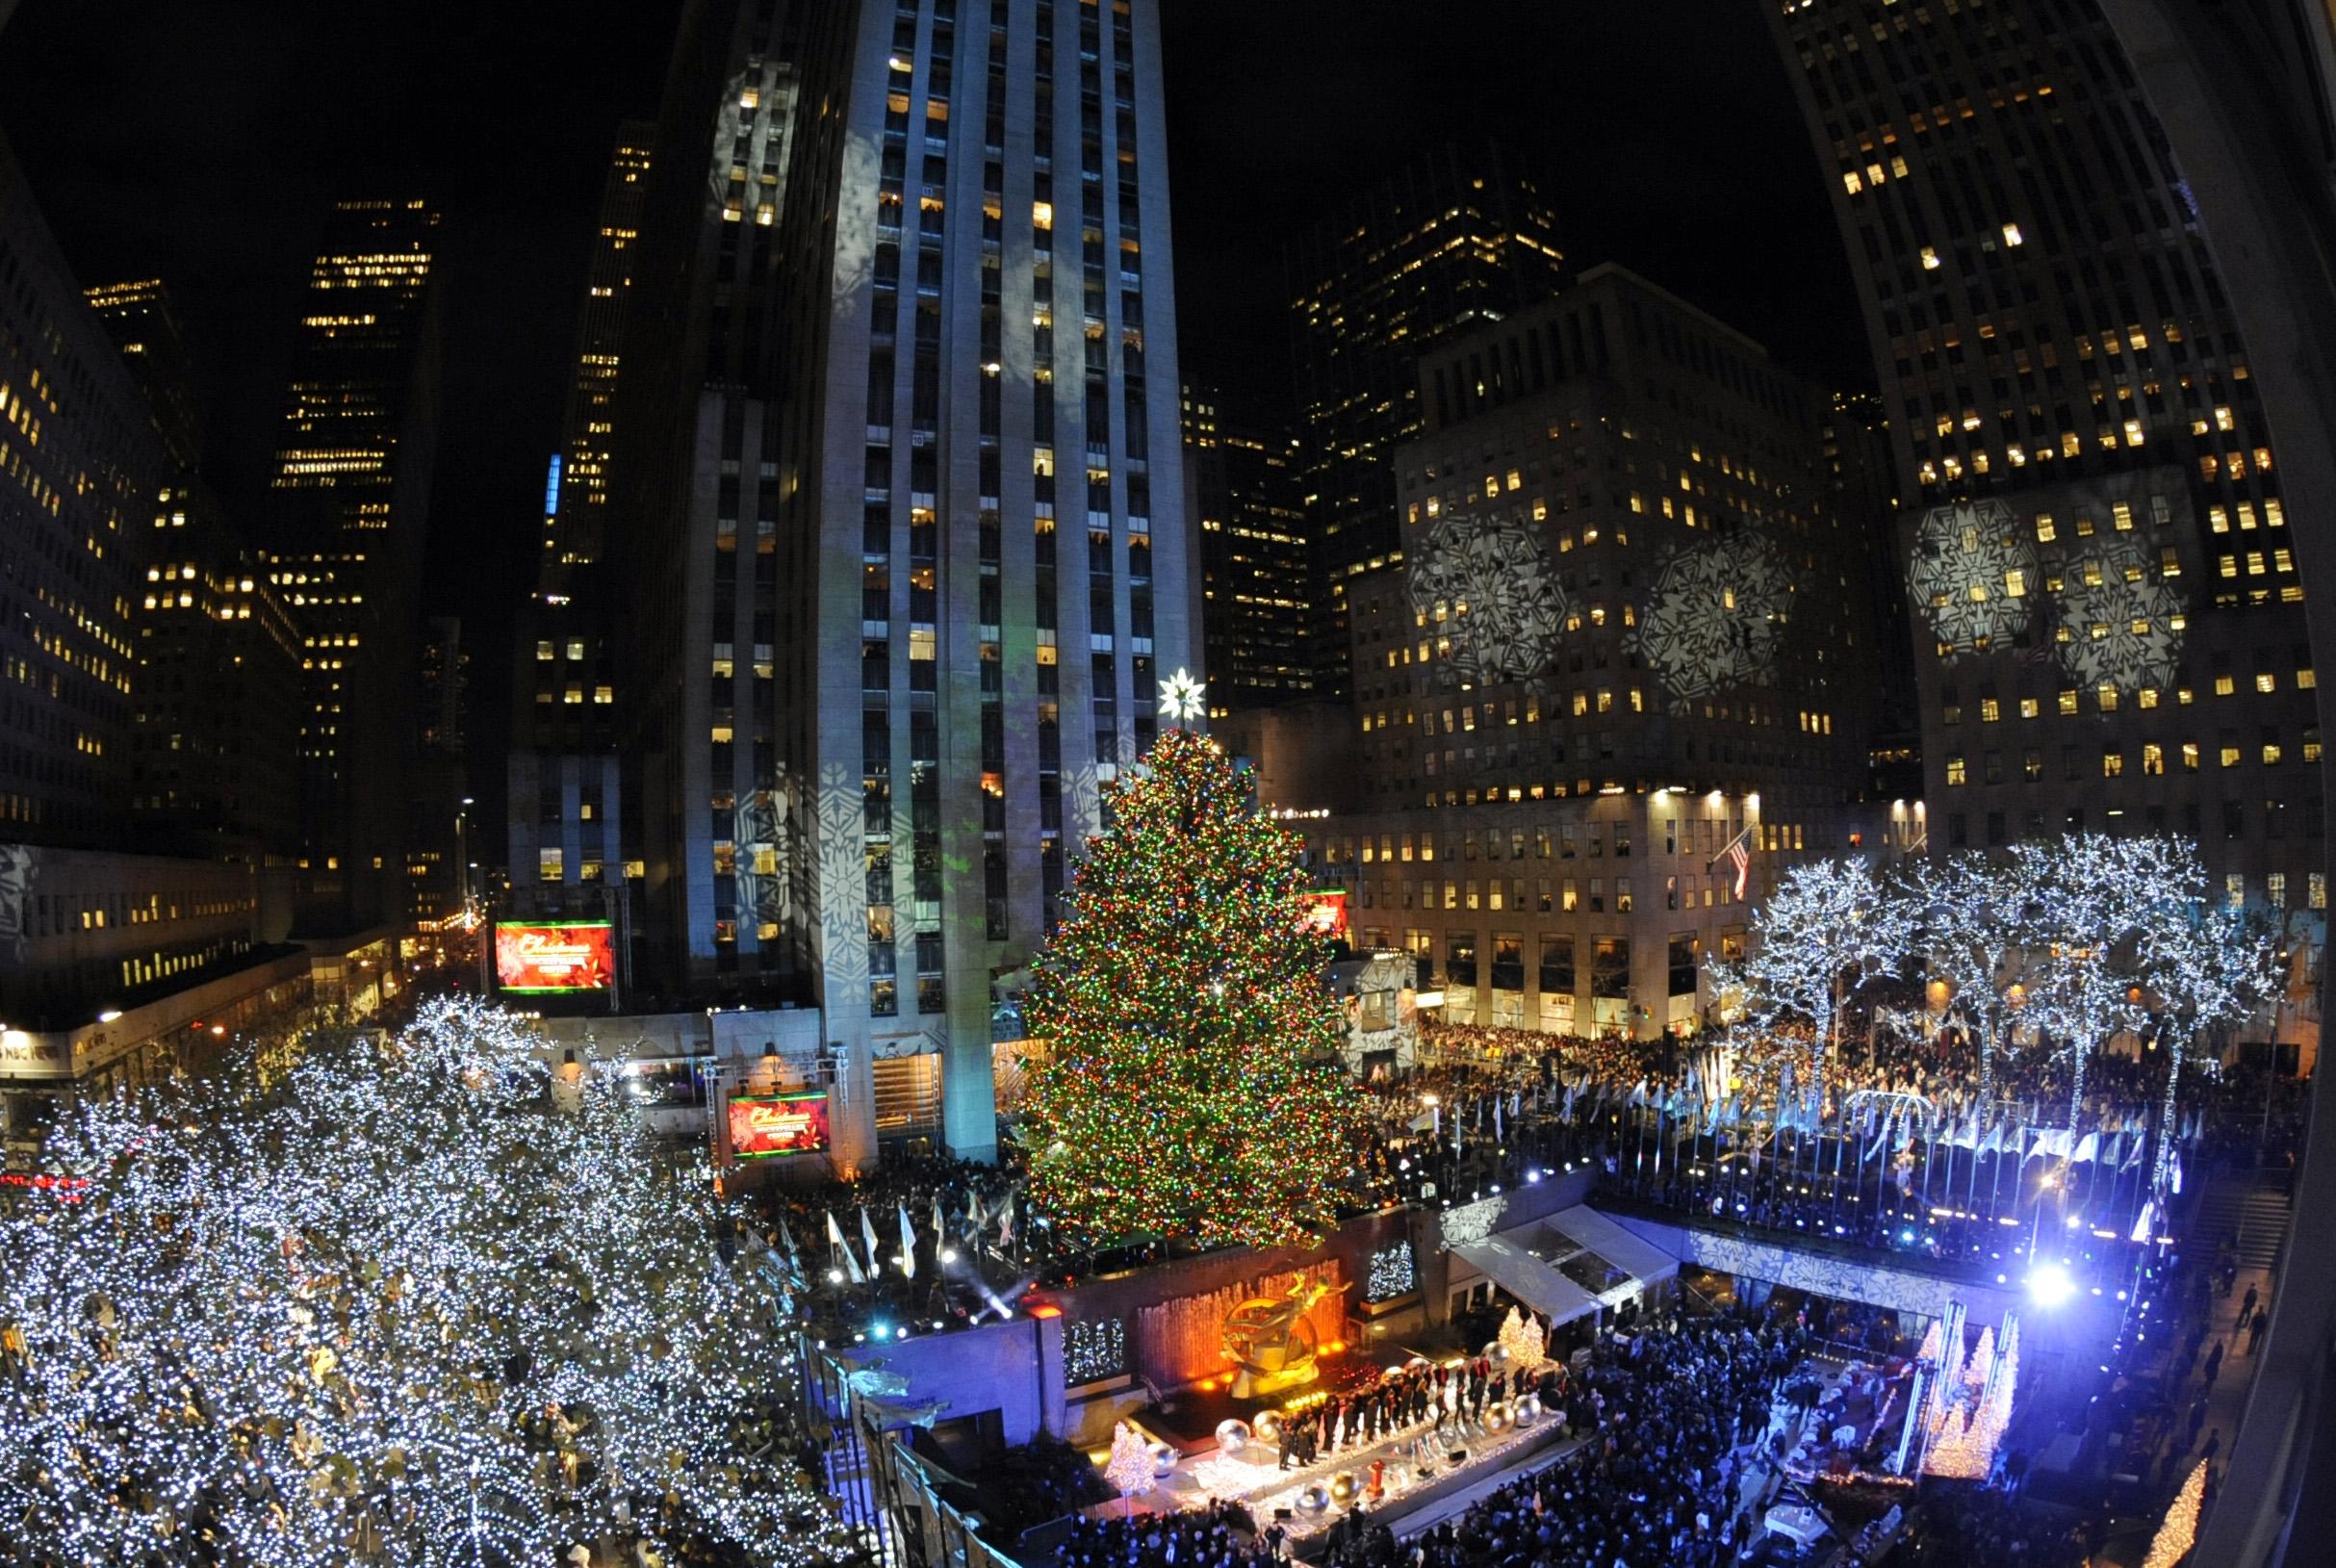 2011 Rockefeller Center Tree